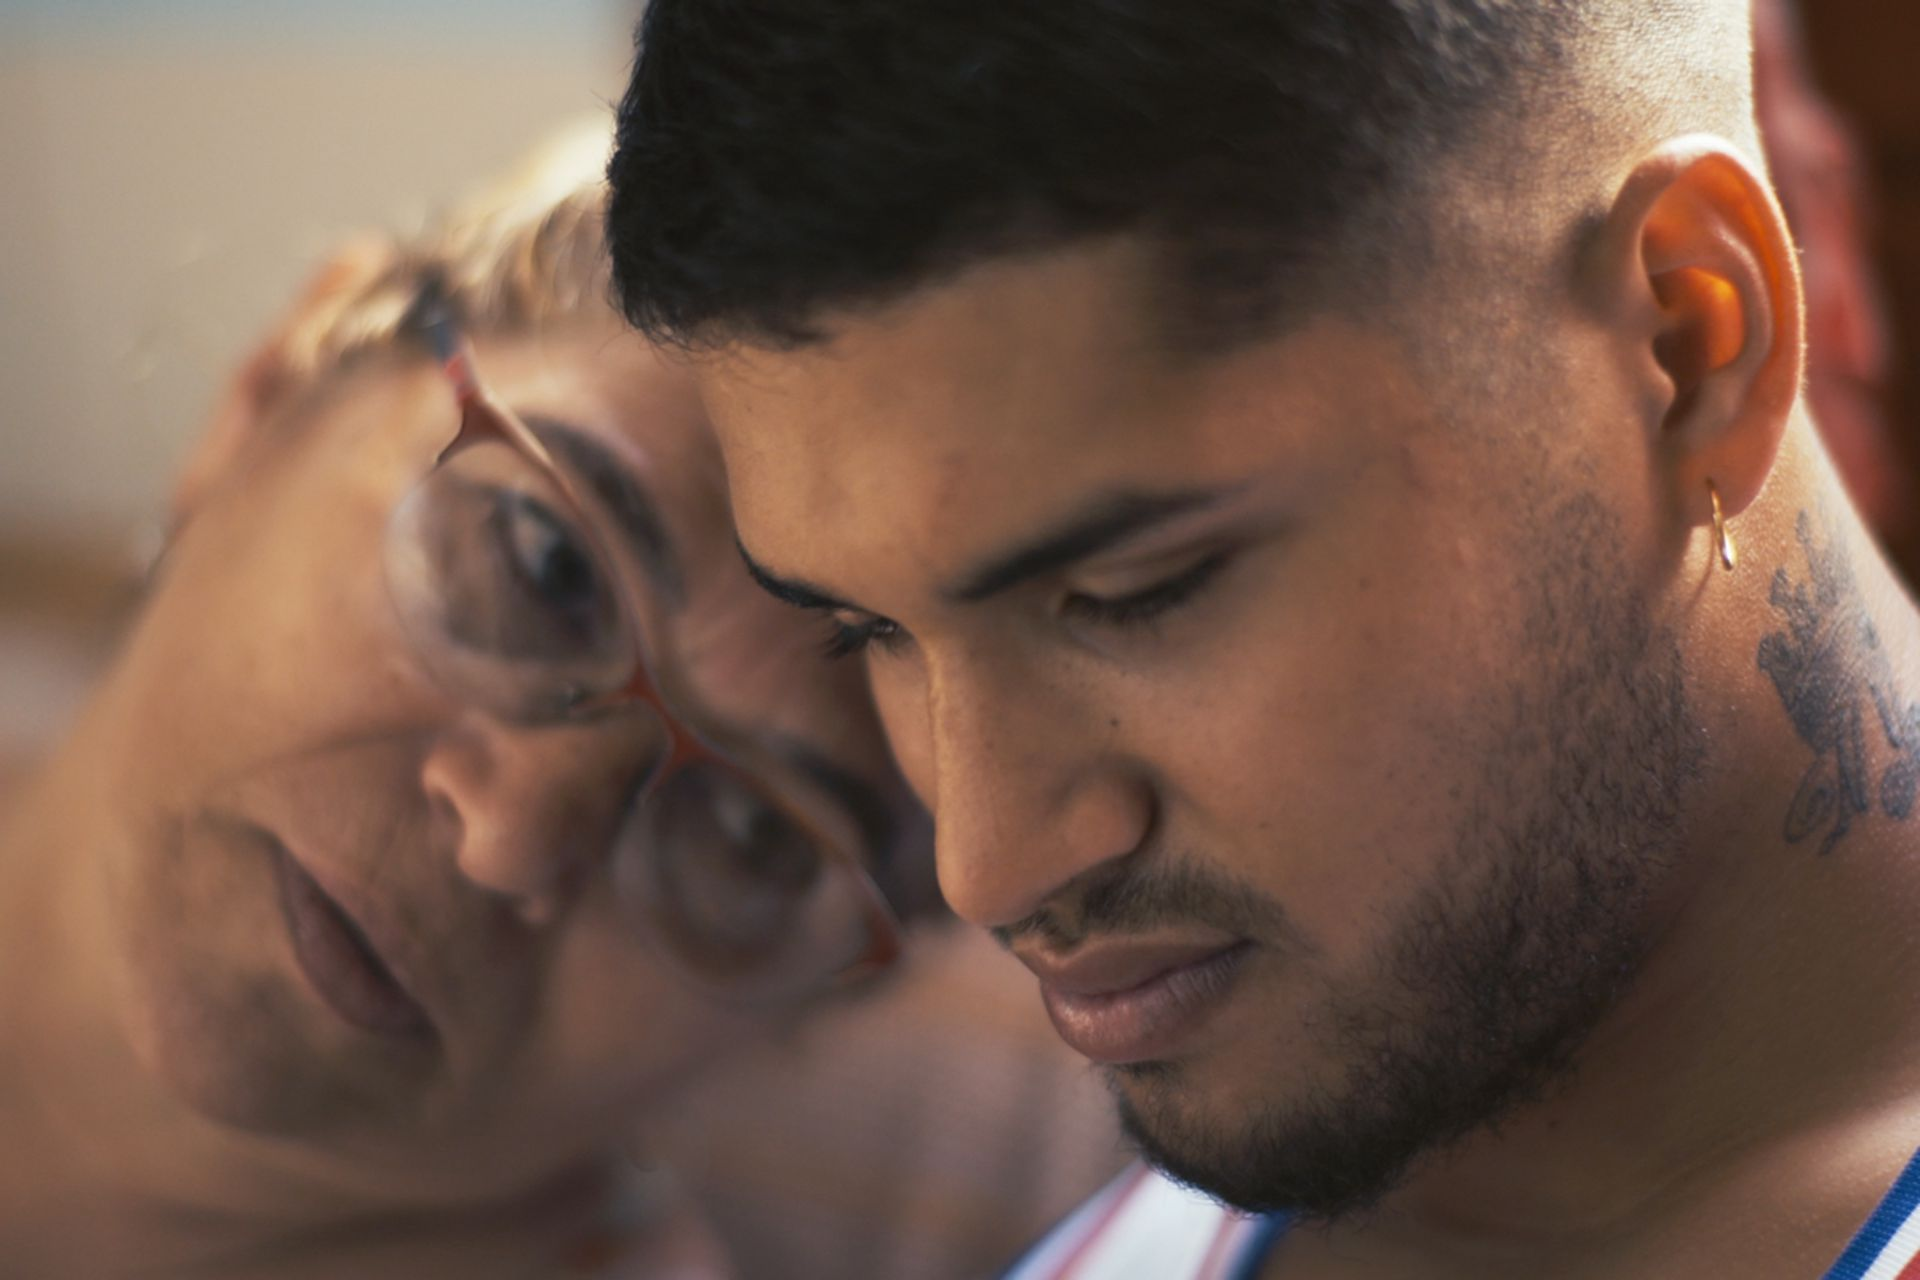 """Mi mamá me ayudó un montón, siempre me daba aliento"", destaca Alexis."